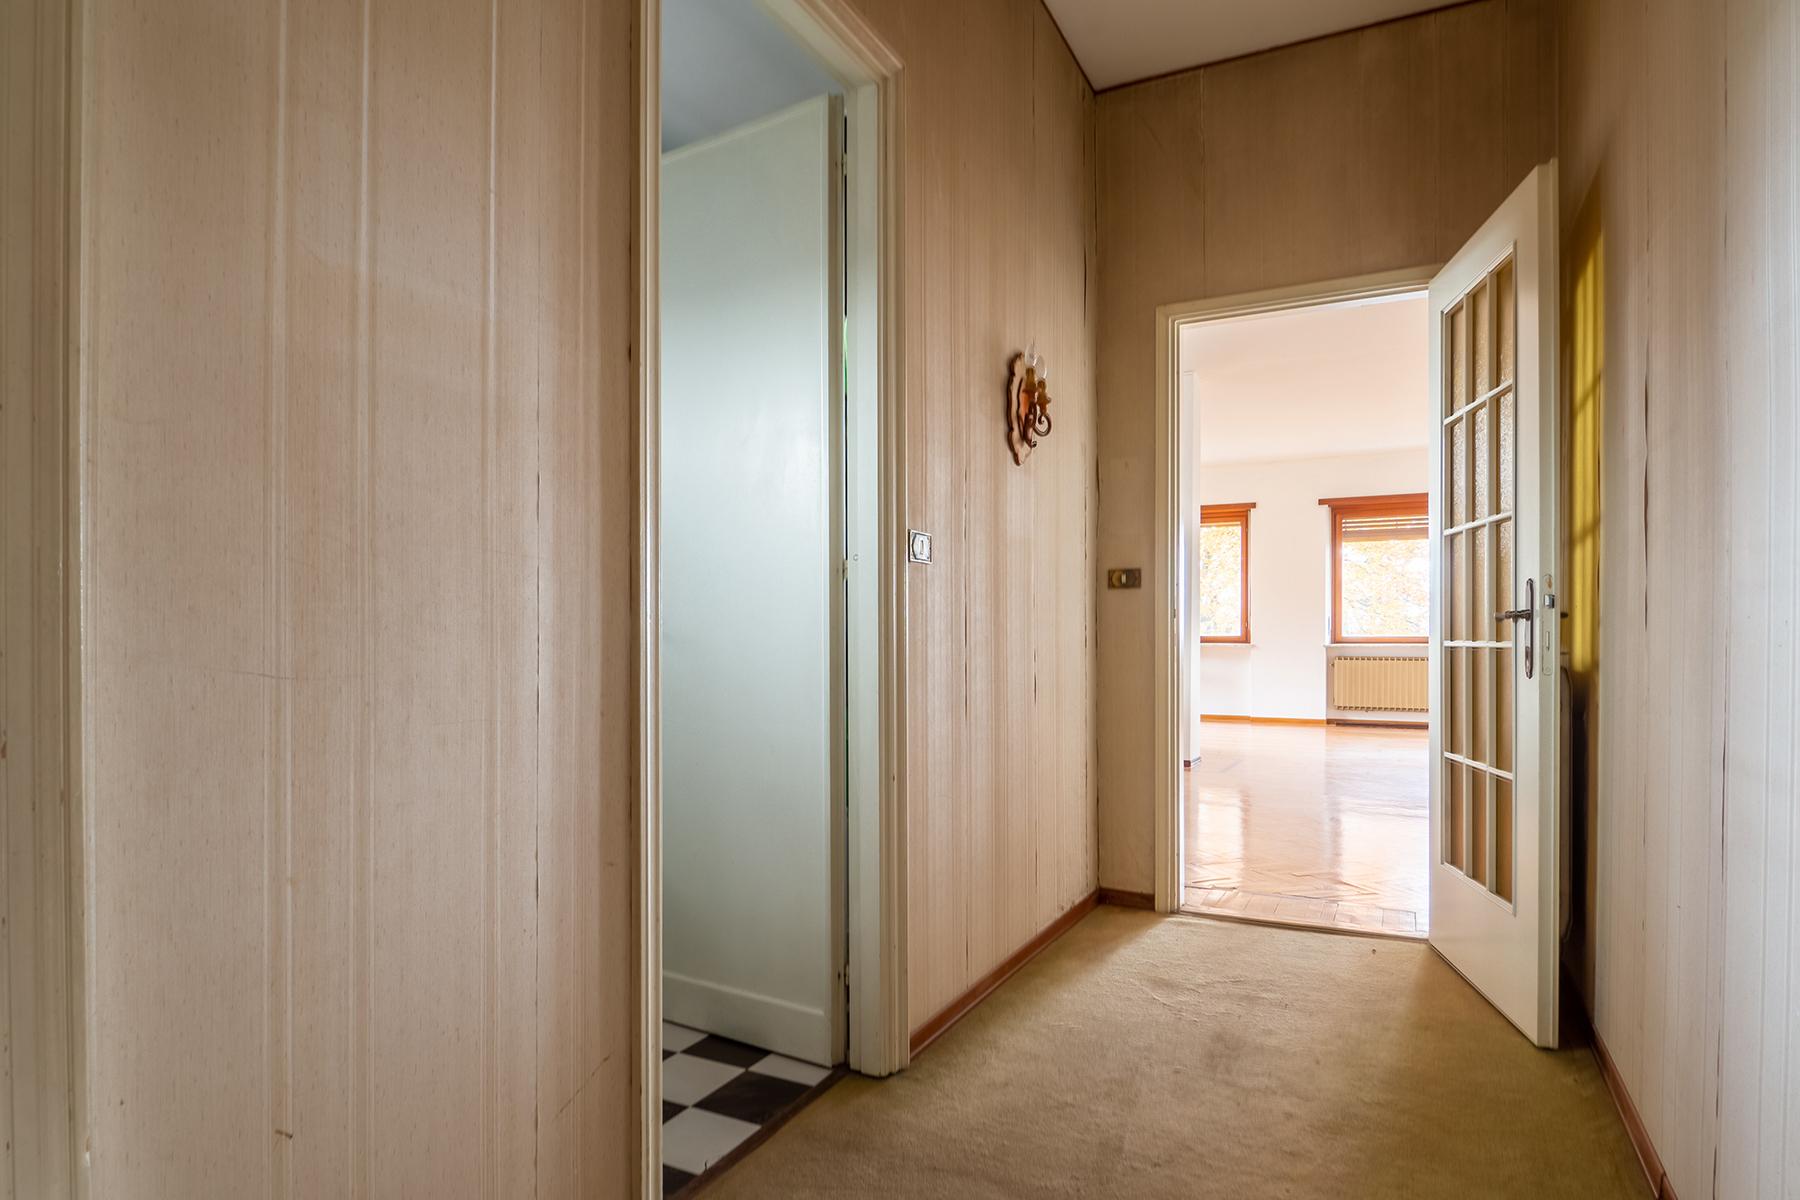 Casa indipendente in Vendita a Torino: 5 locali, 277 mq - Foto 16